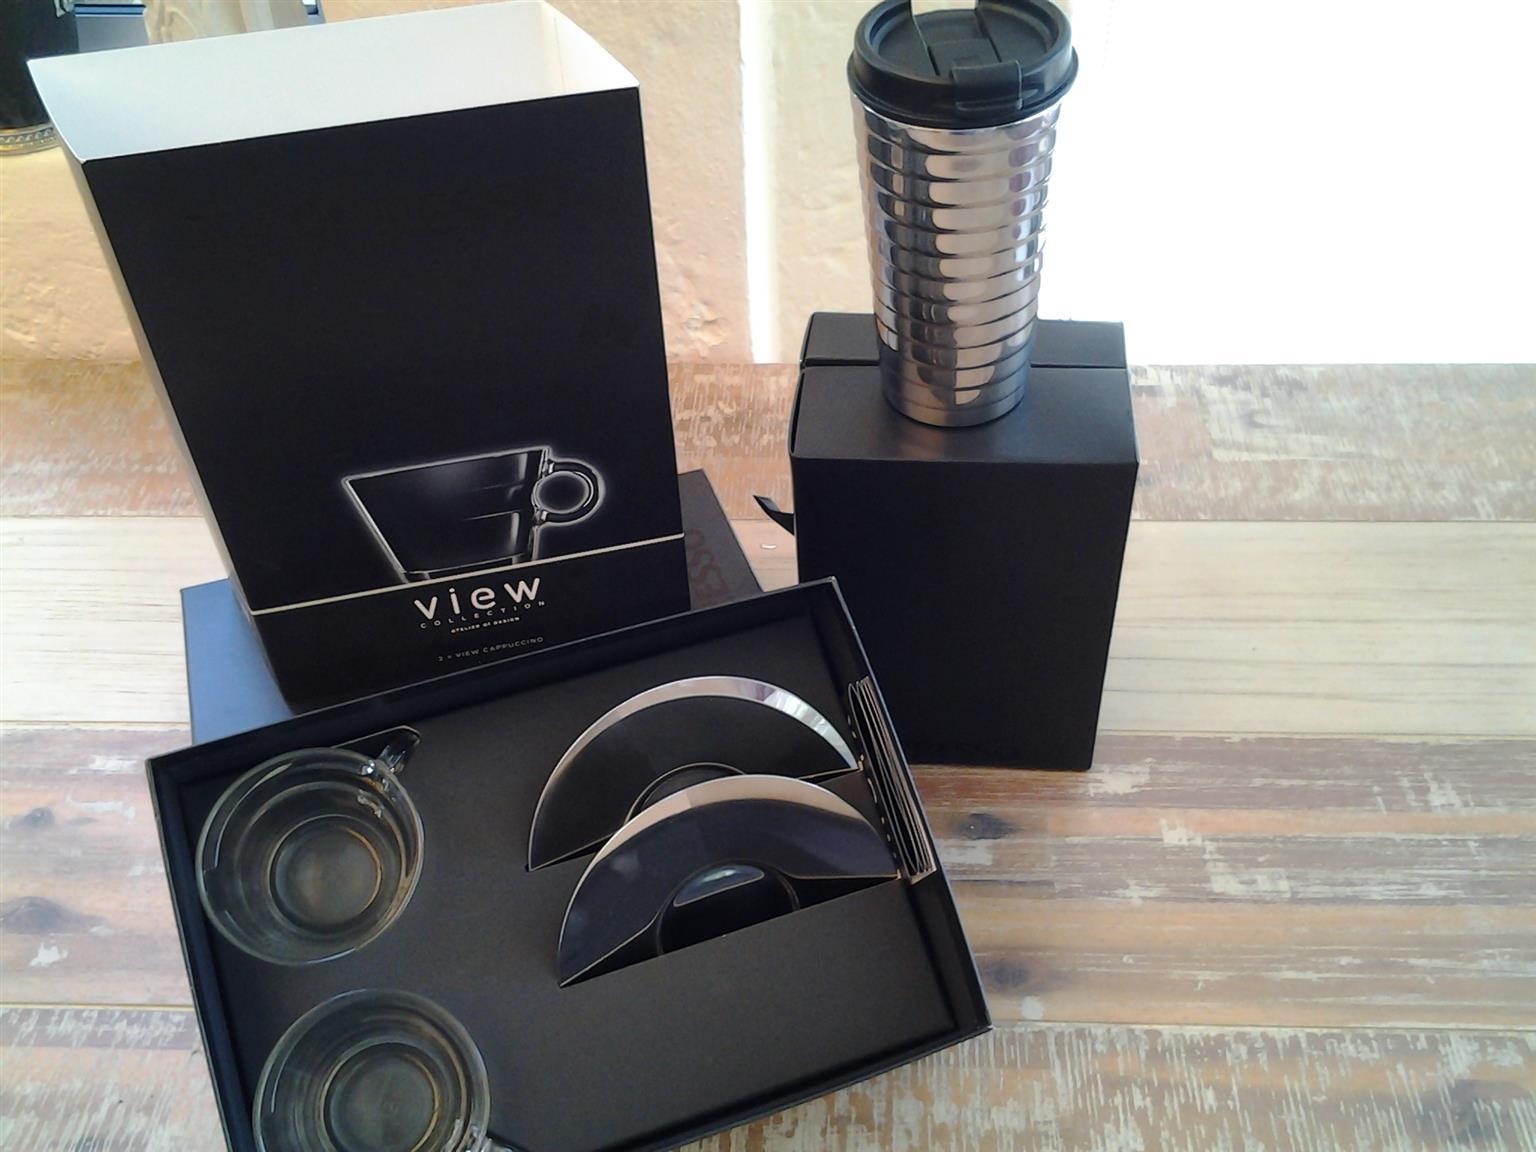 Nespresso Coffee Cups and travel mug